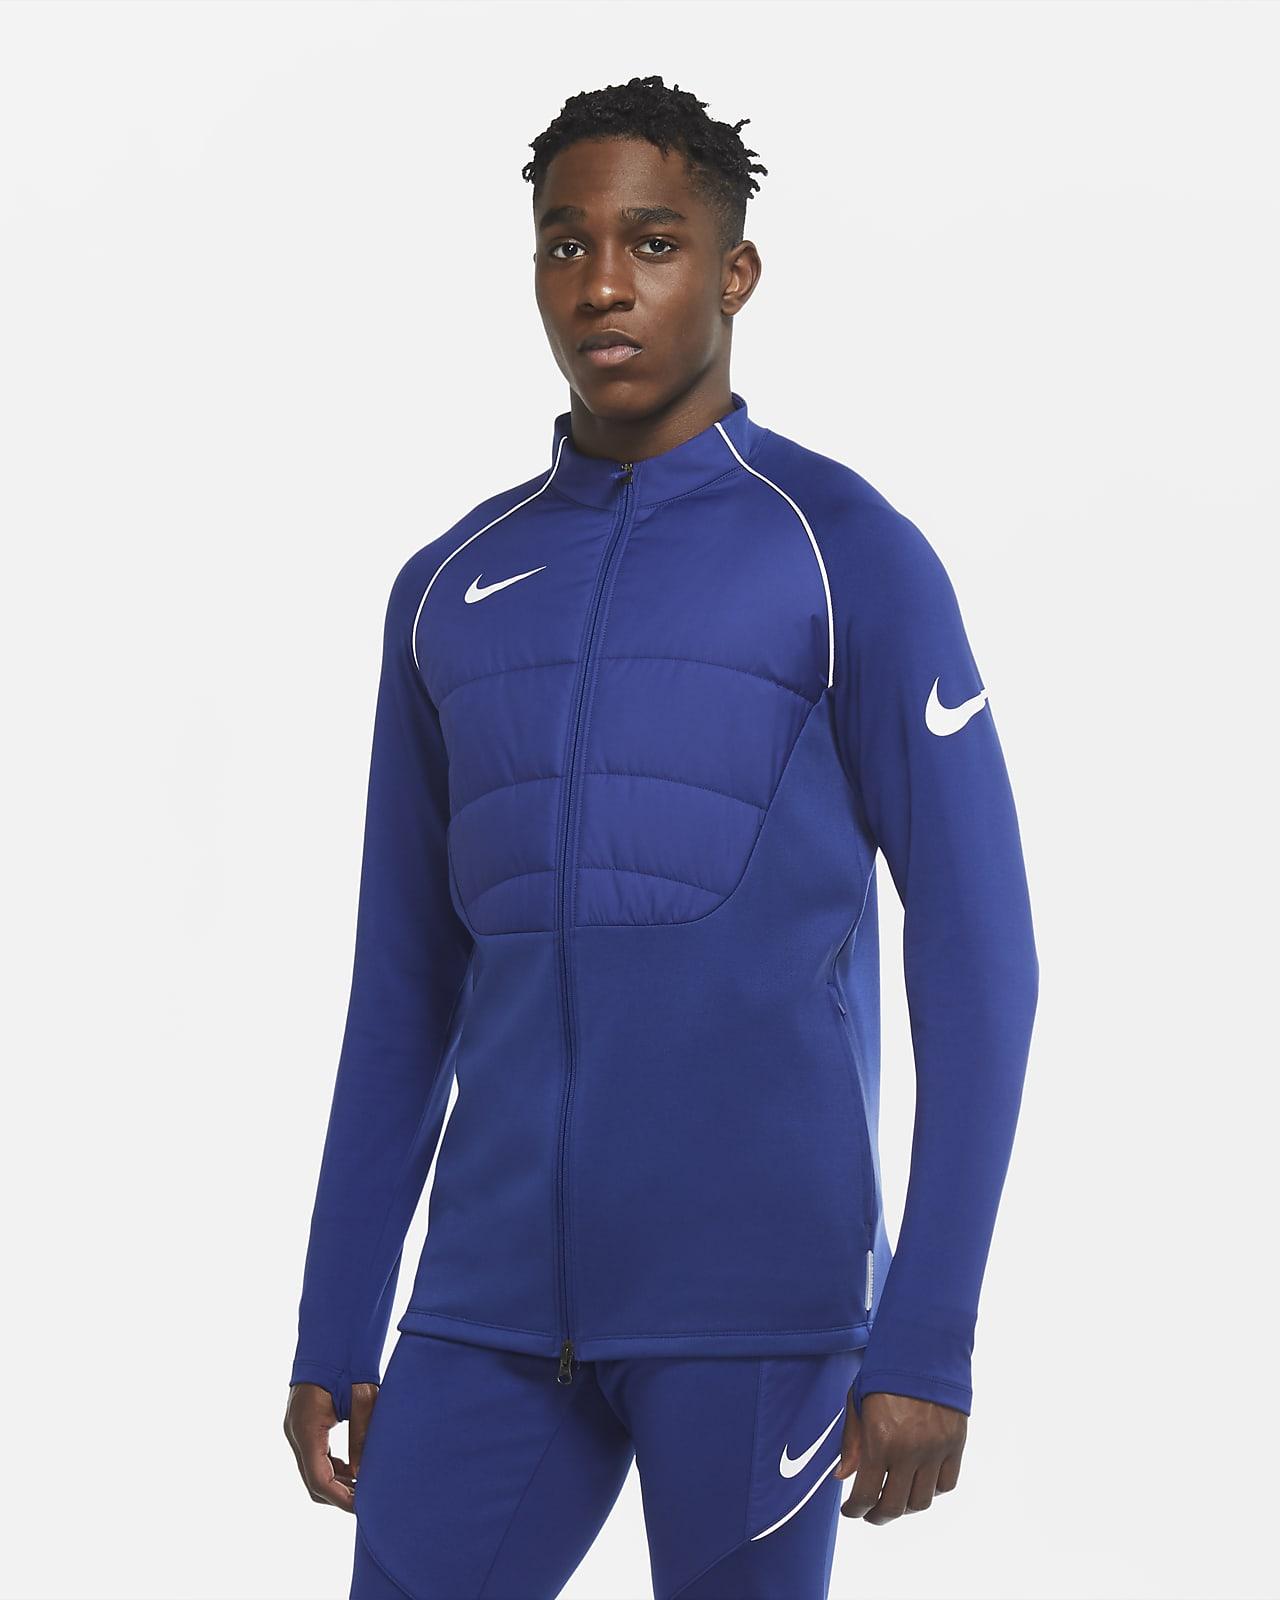 Pánská fotbalová tréninková bunda Nike Therma Strike Winter Warrior